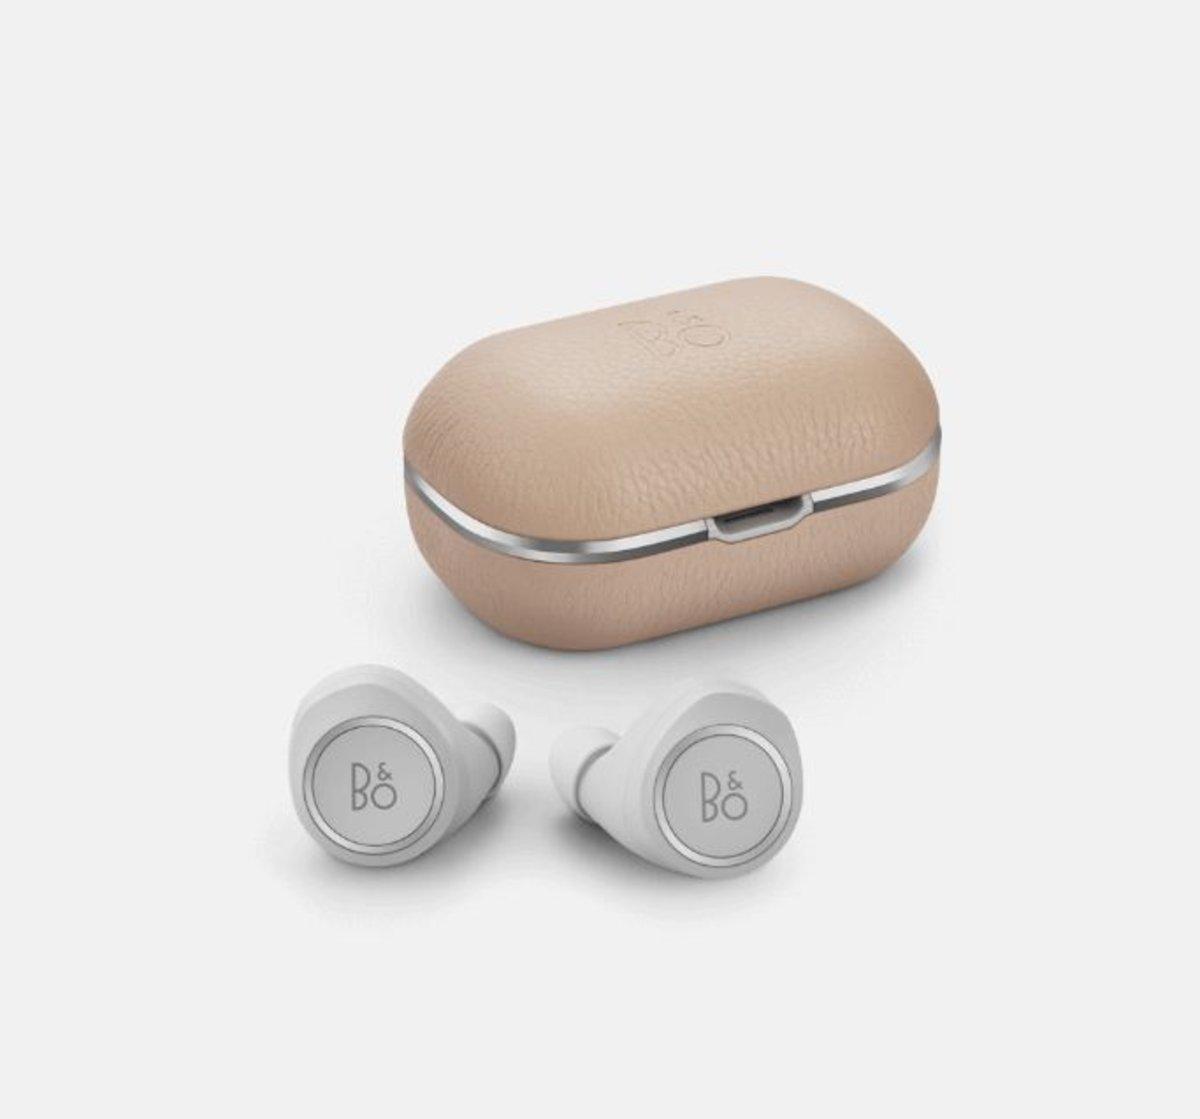 B&o BeoPlay E8 2.0 True Wireless Bluetooth Earphone Natural